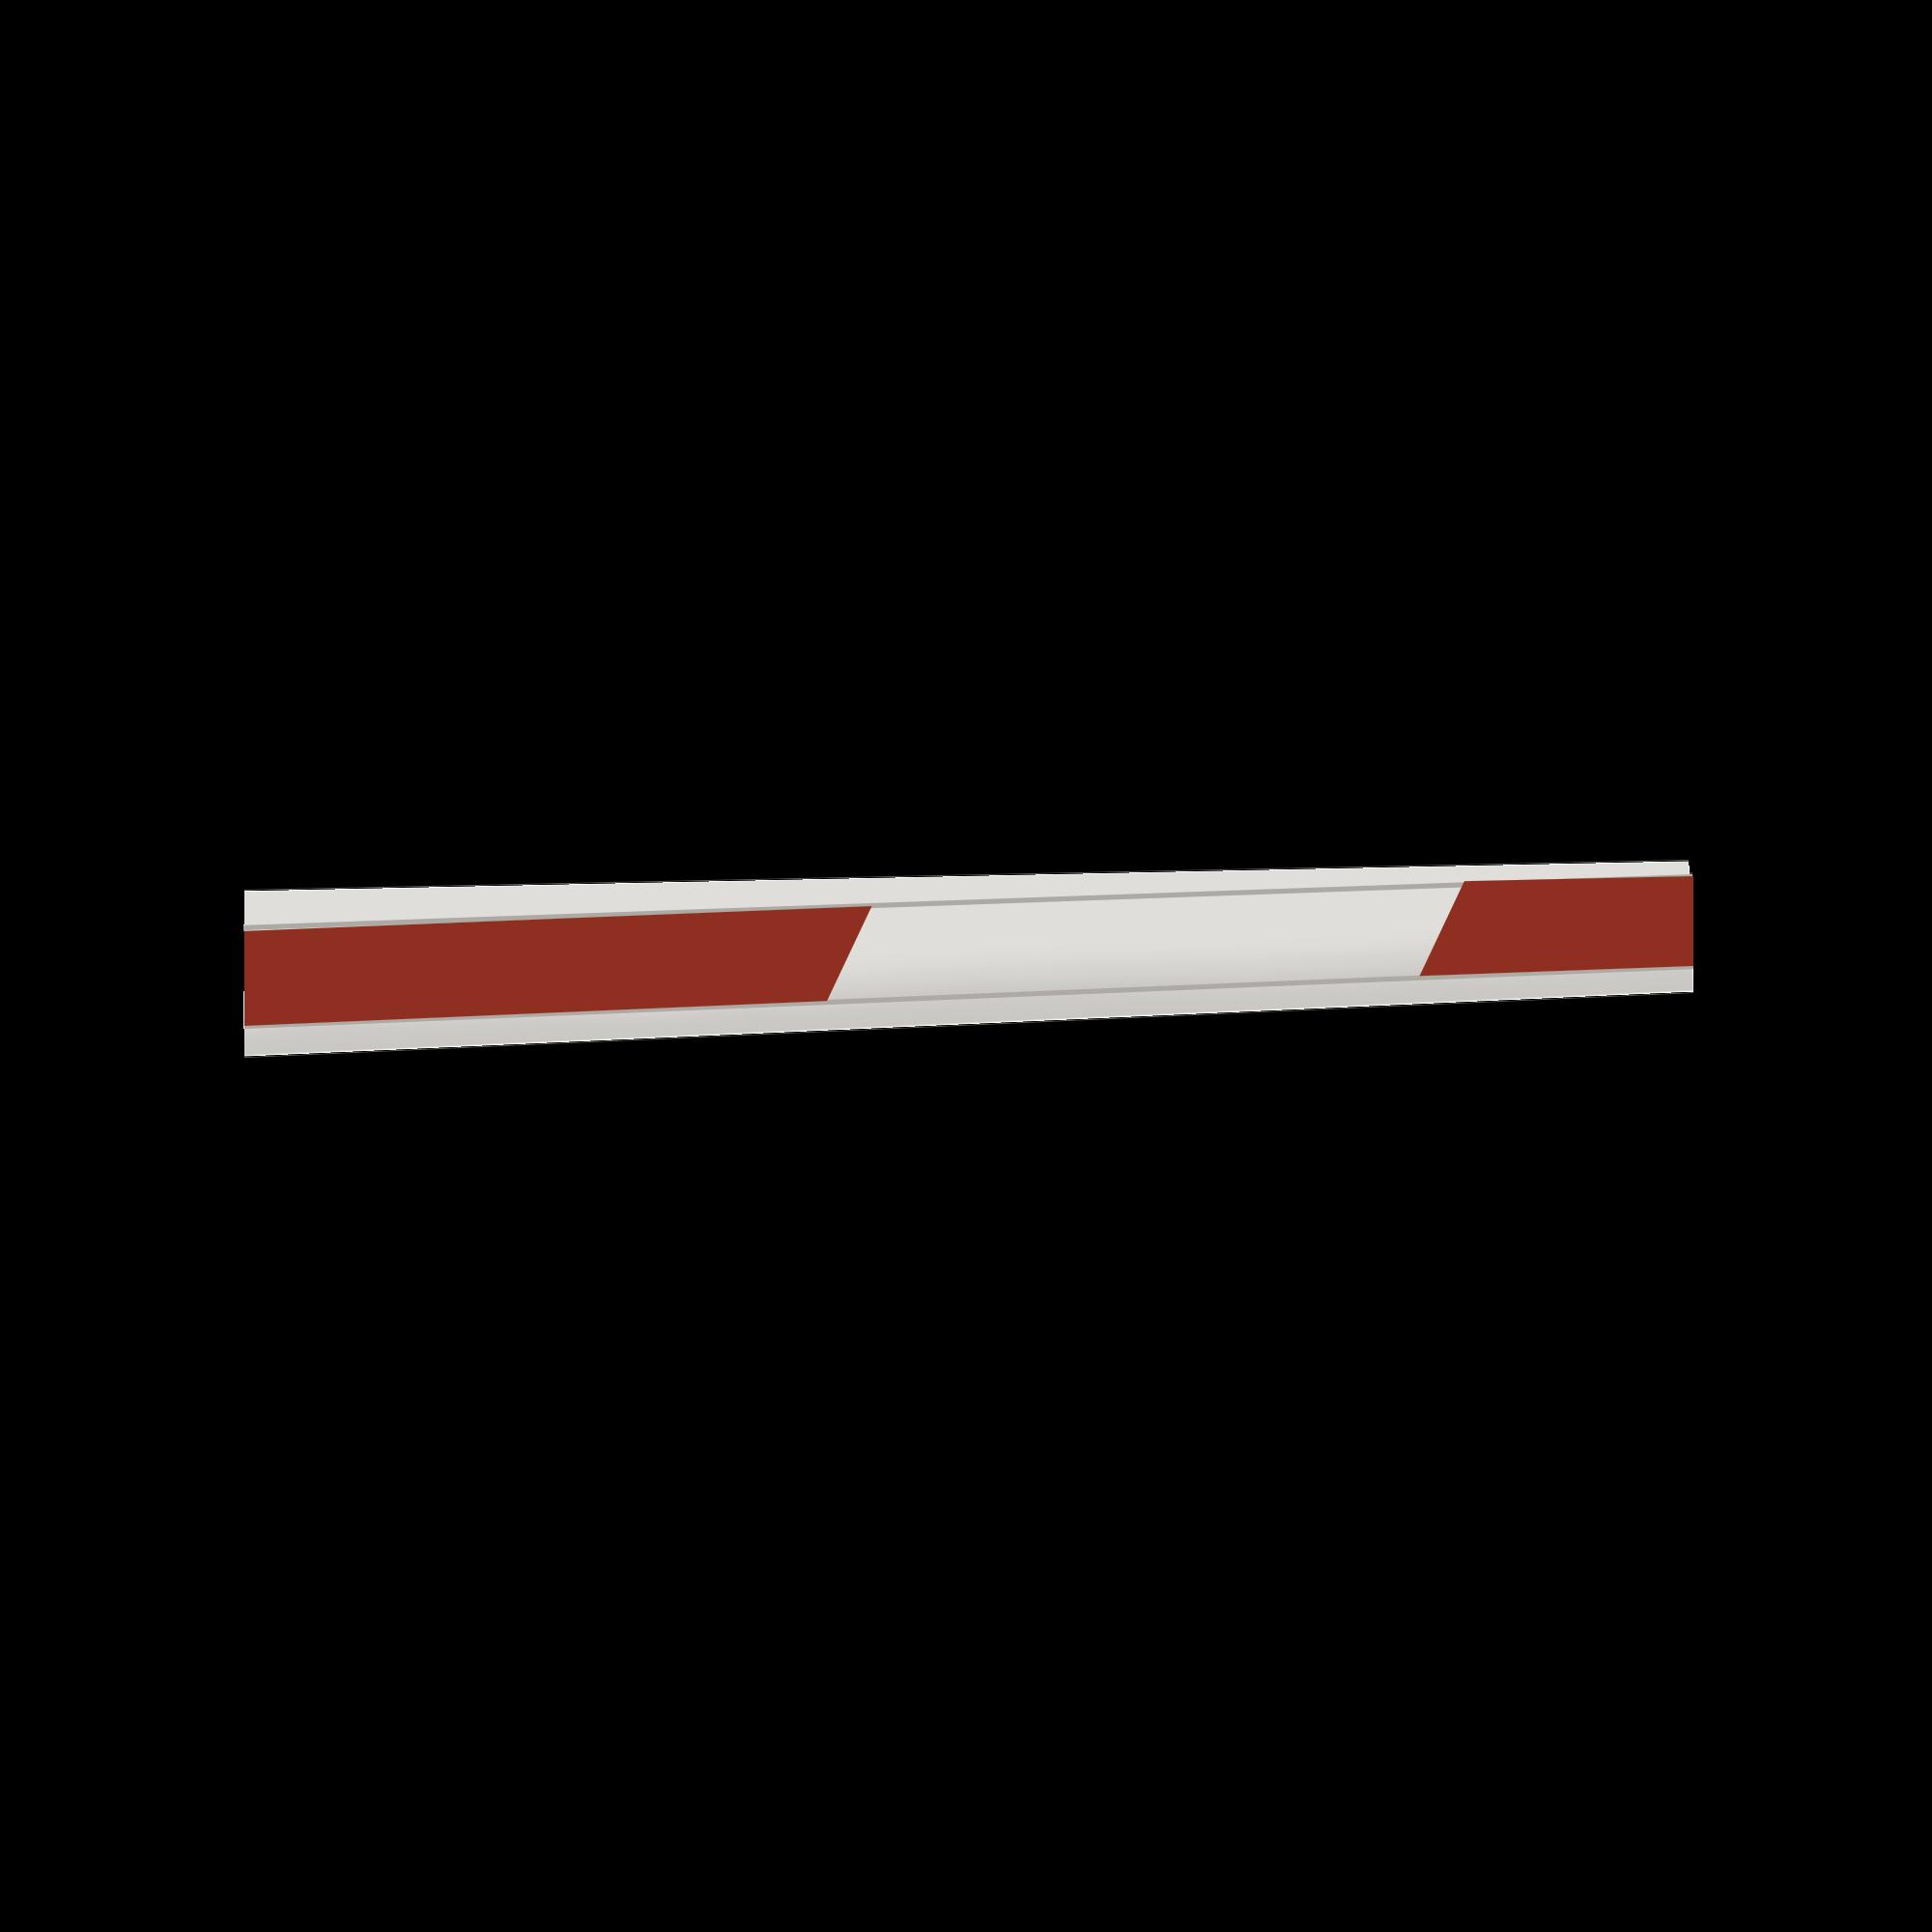 Brazo Rectangular de 7 mts para barrera FAAC 640